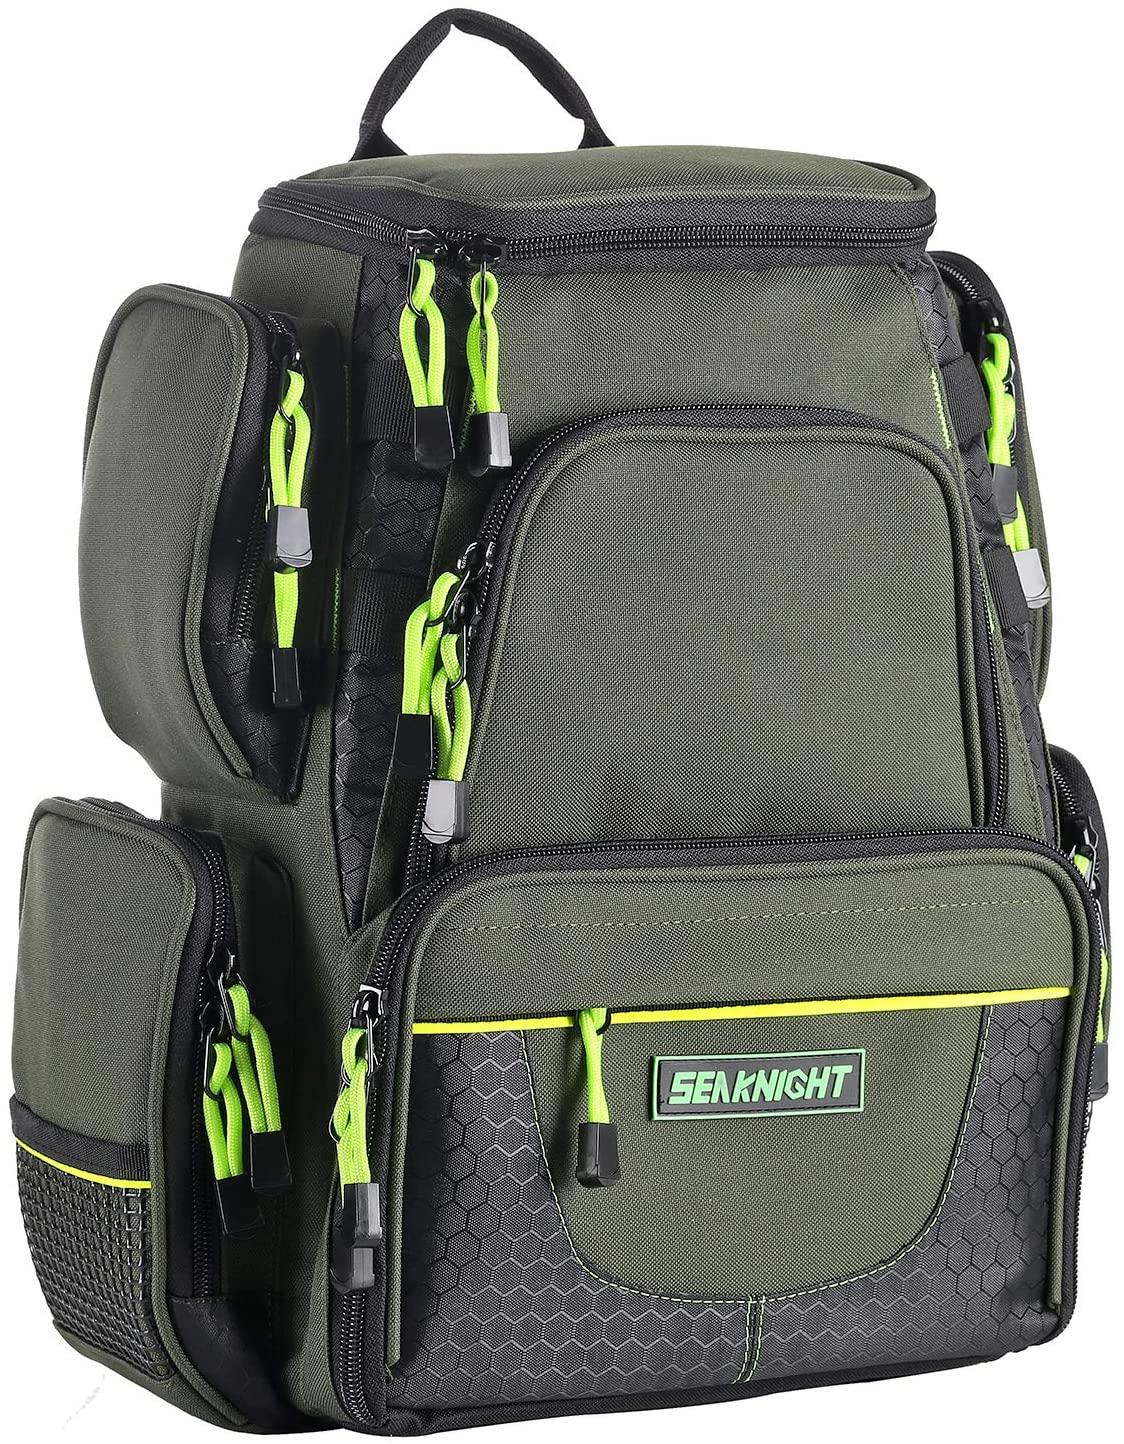 SeaKnight Multifunctional Bag